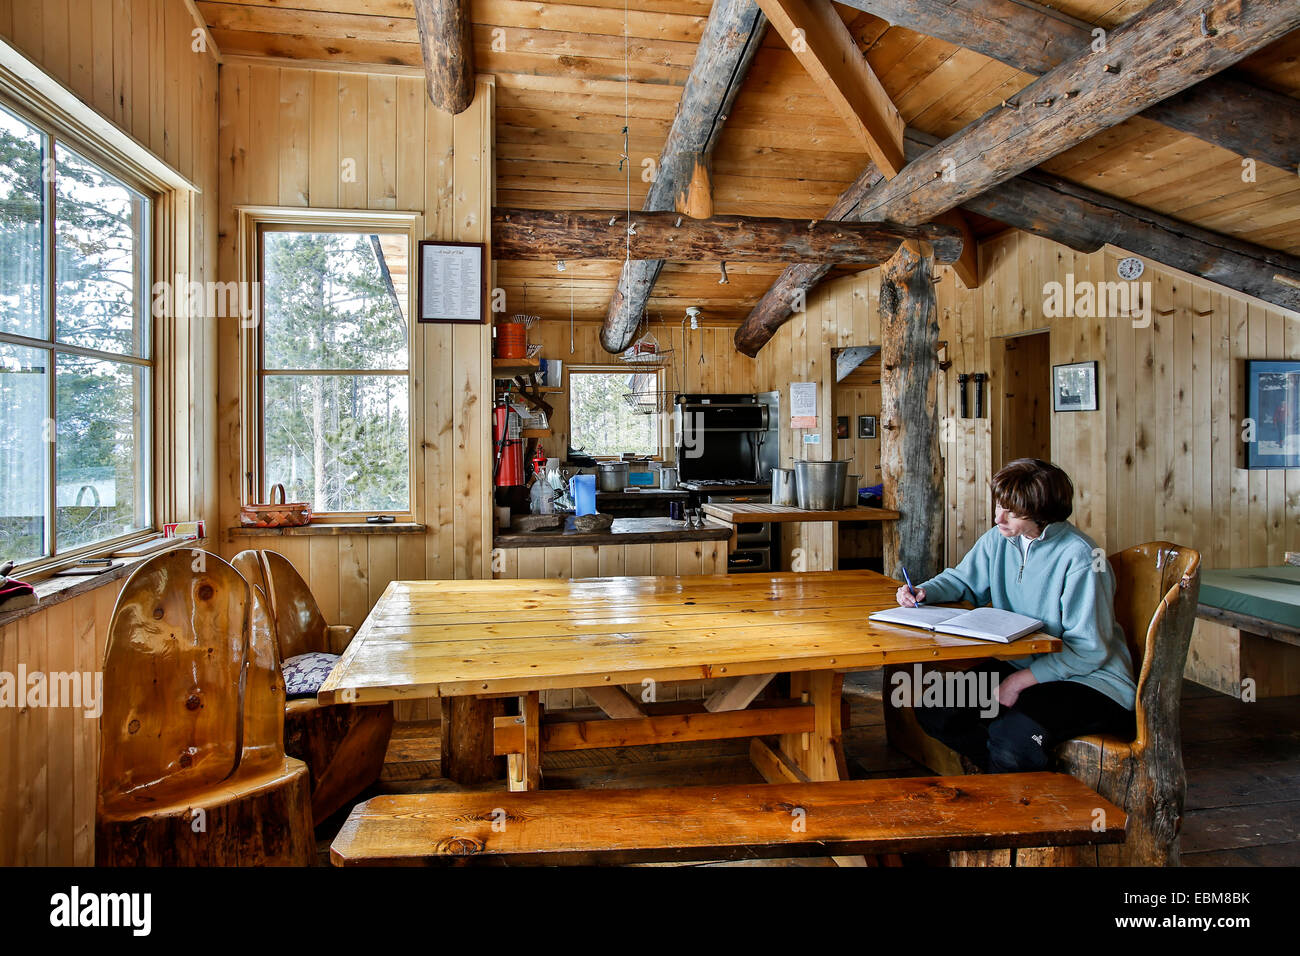 Interiors Hut Stockfotos & Interiors Hut Bilder - Alamy